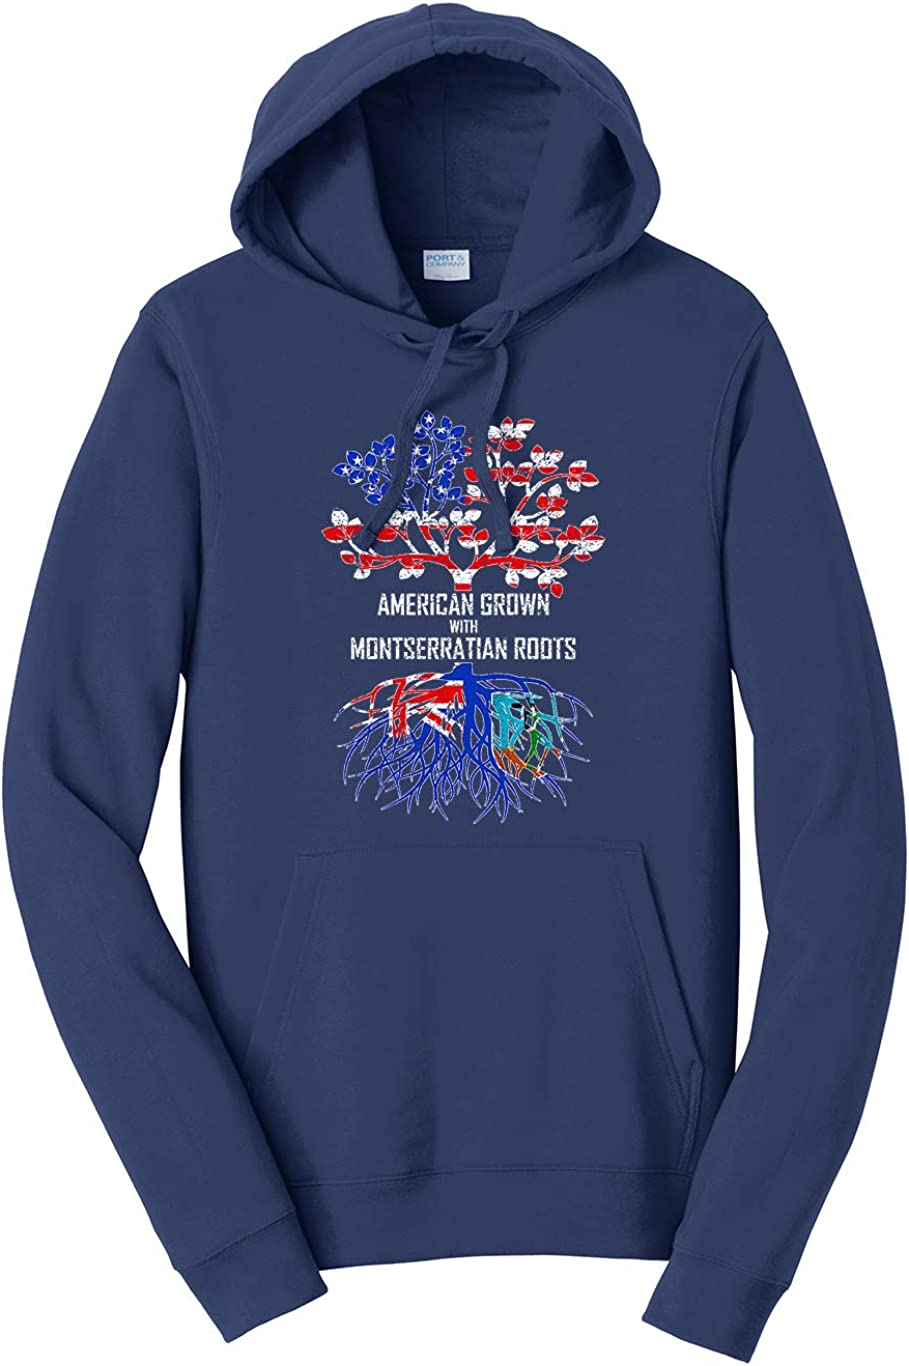 Tenacitee Unisex American Grown with Montserratian Roots Hooded Sweatshirt